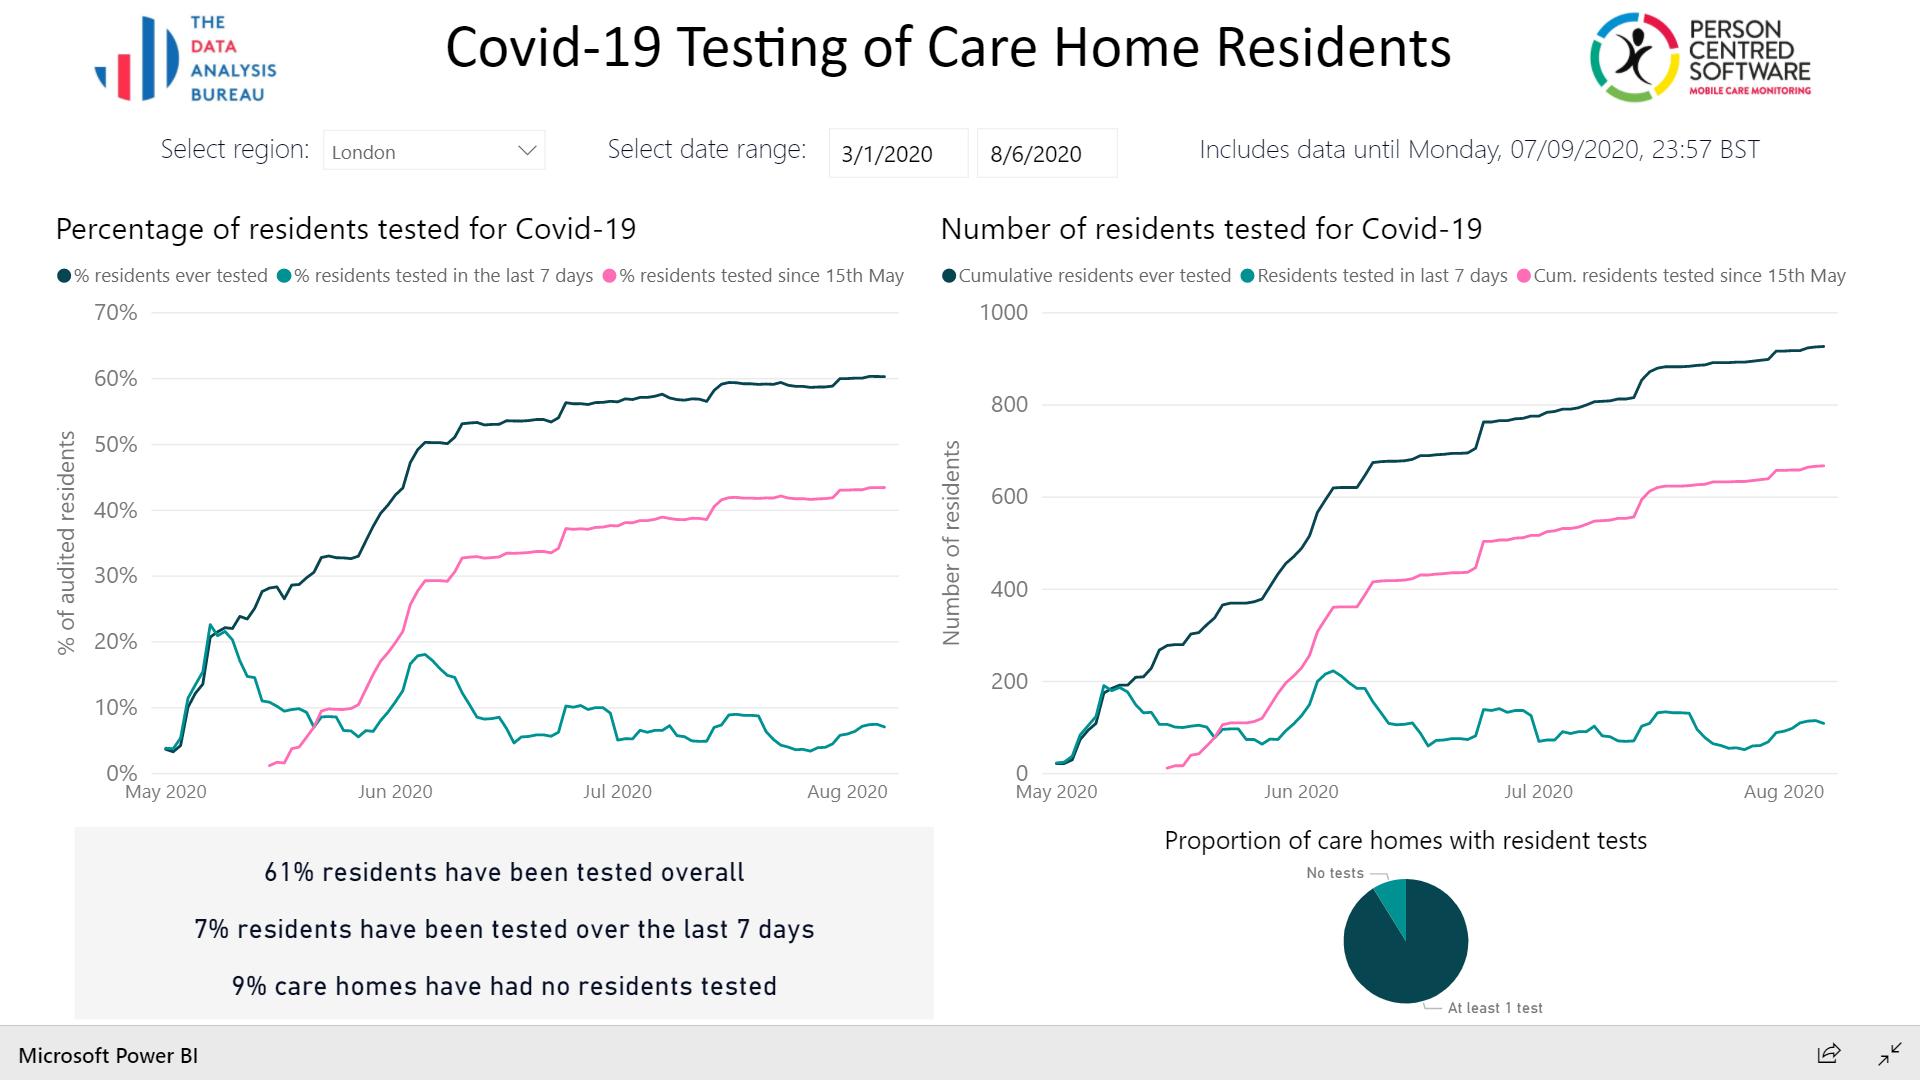 UK CARE HOME COVID-19 TESTING TRACKER